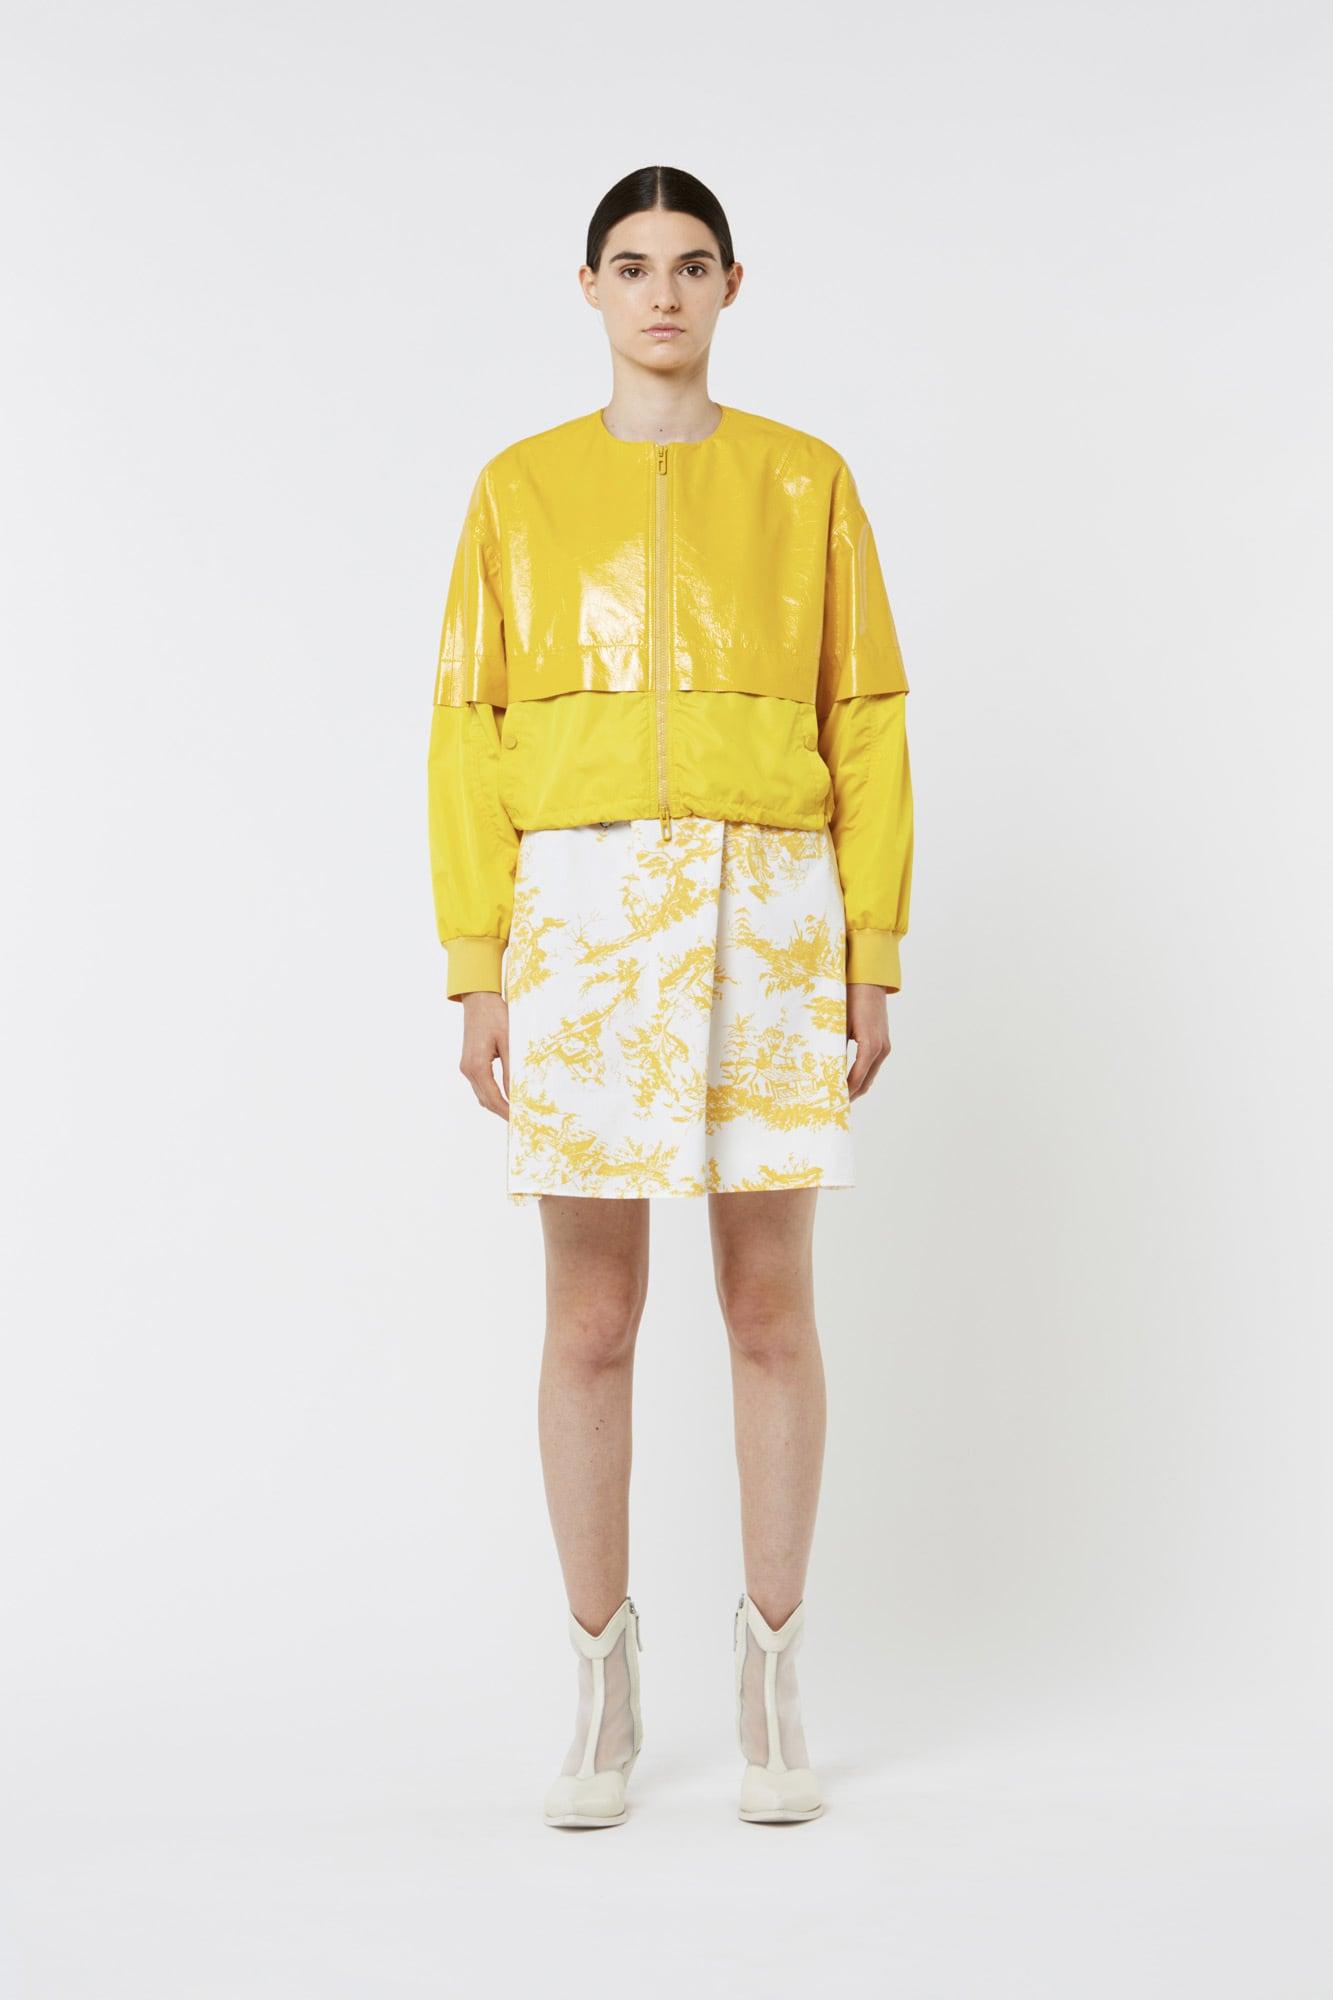 Yellow Nylon Leather Jacket